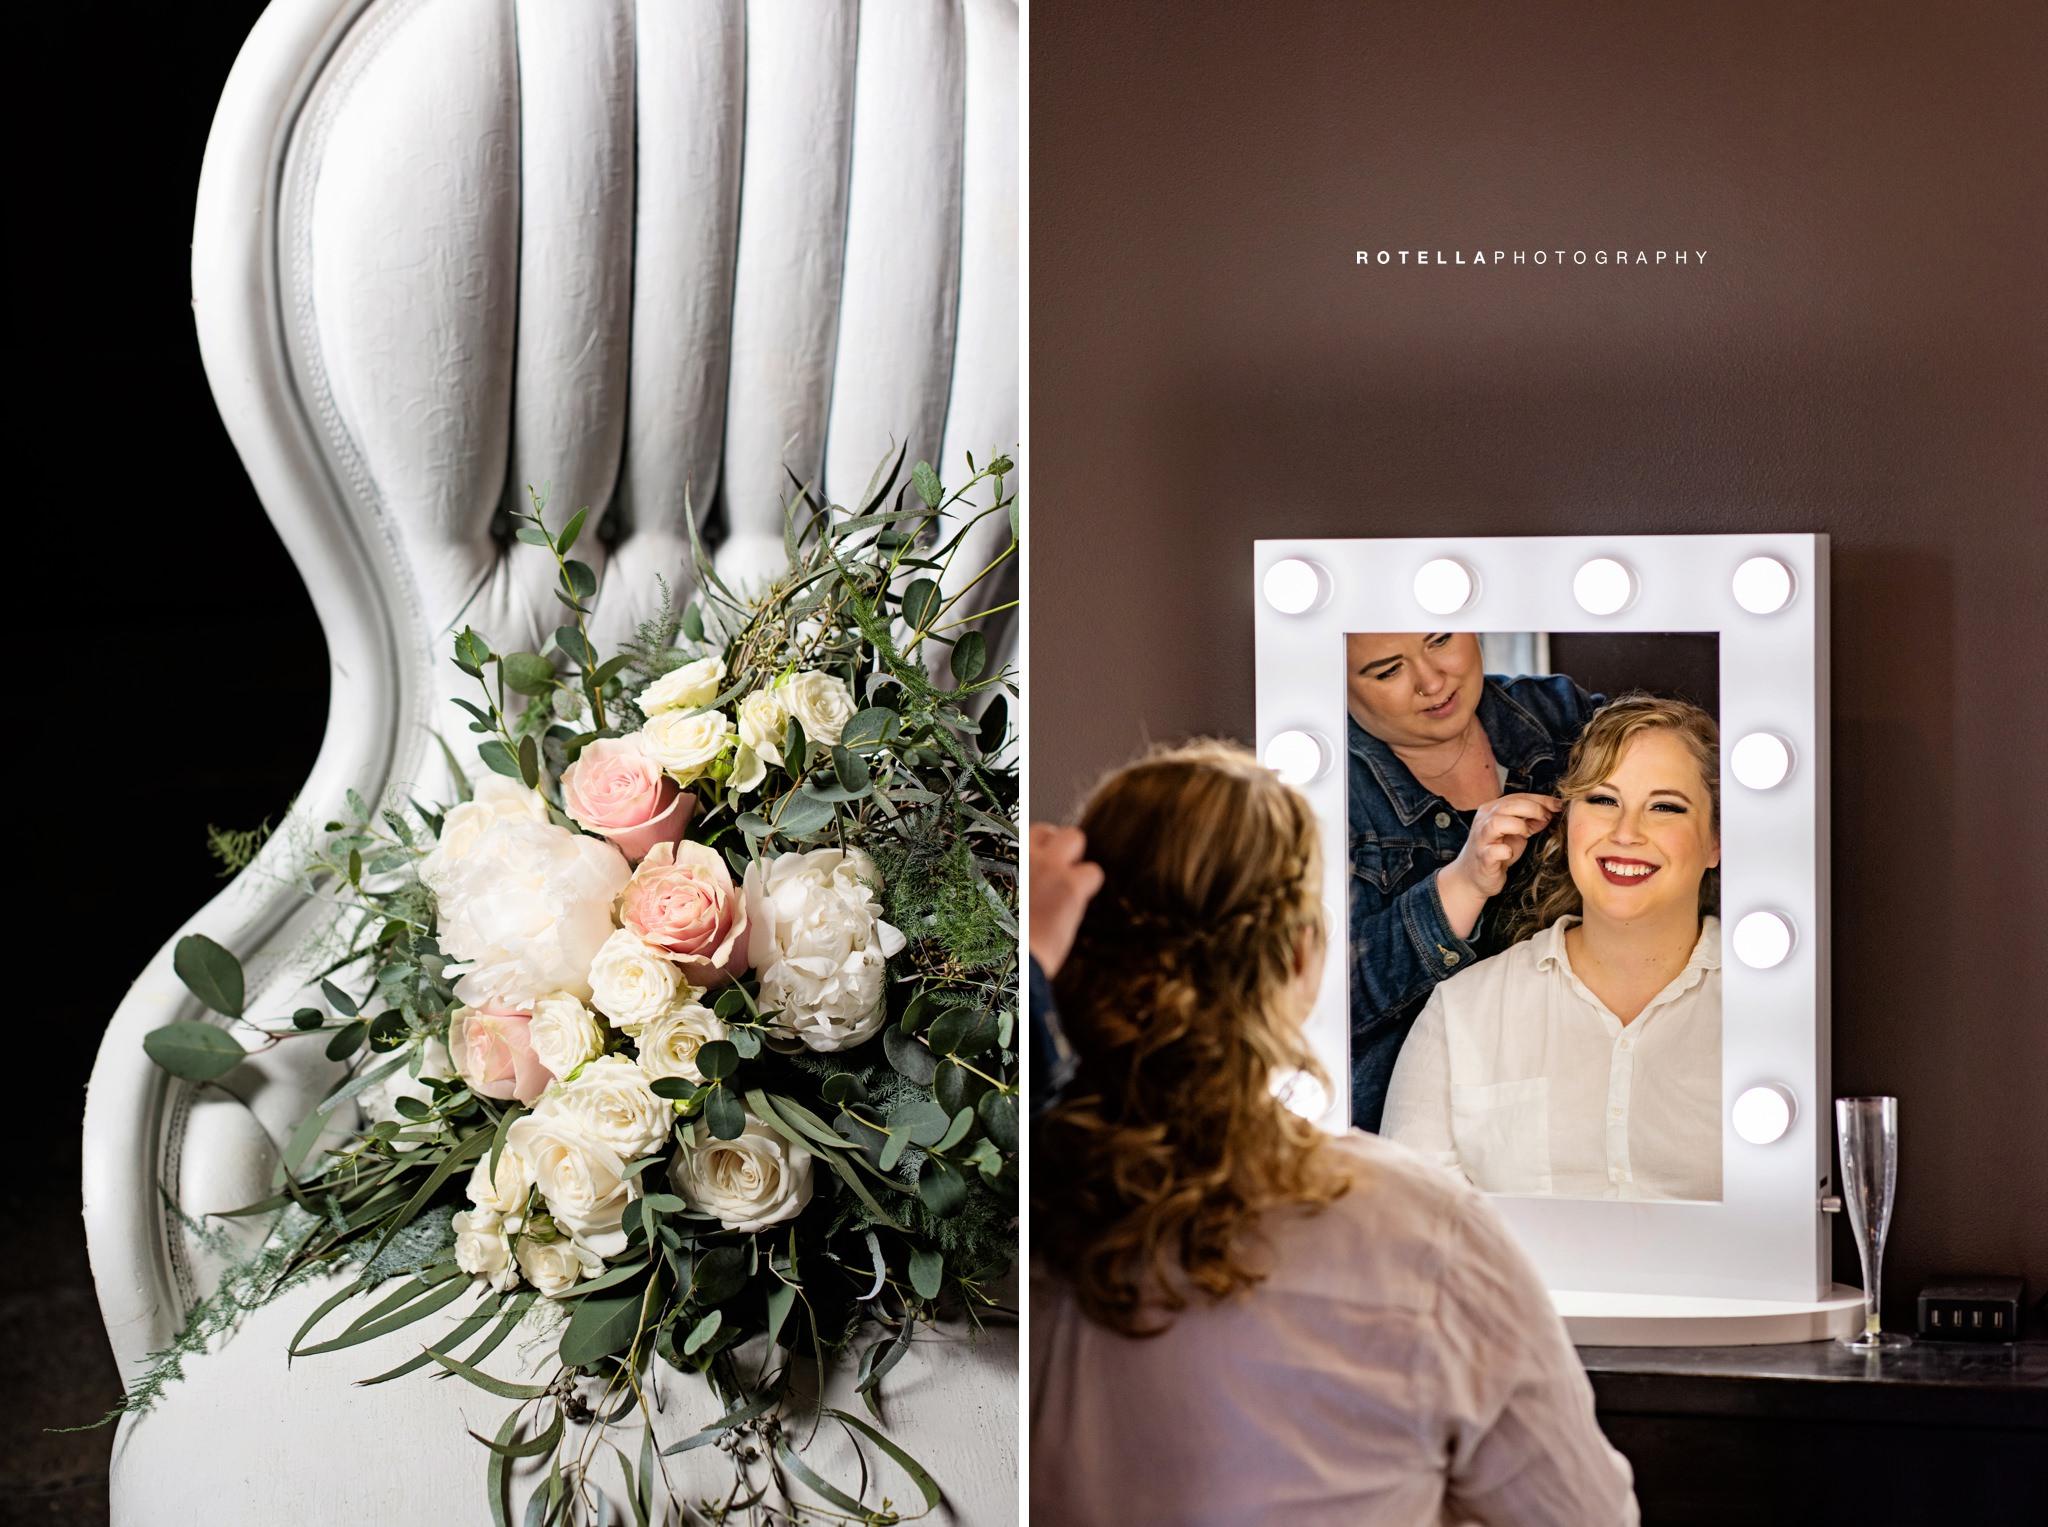 Cassie-Corbin-Wedding-05-25-2019-Rotella-Photography-PREV-97-46_BLOG.jpg